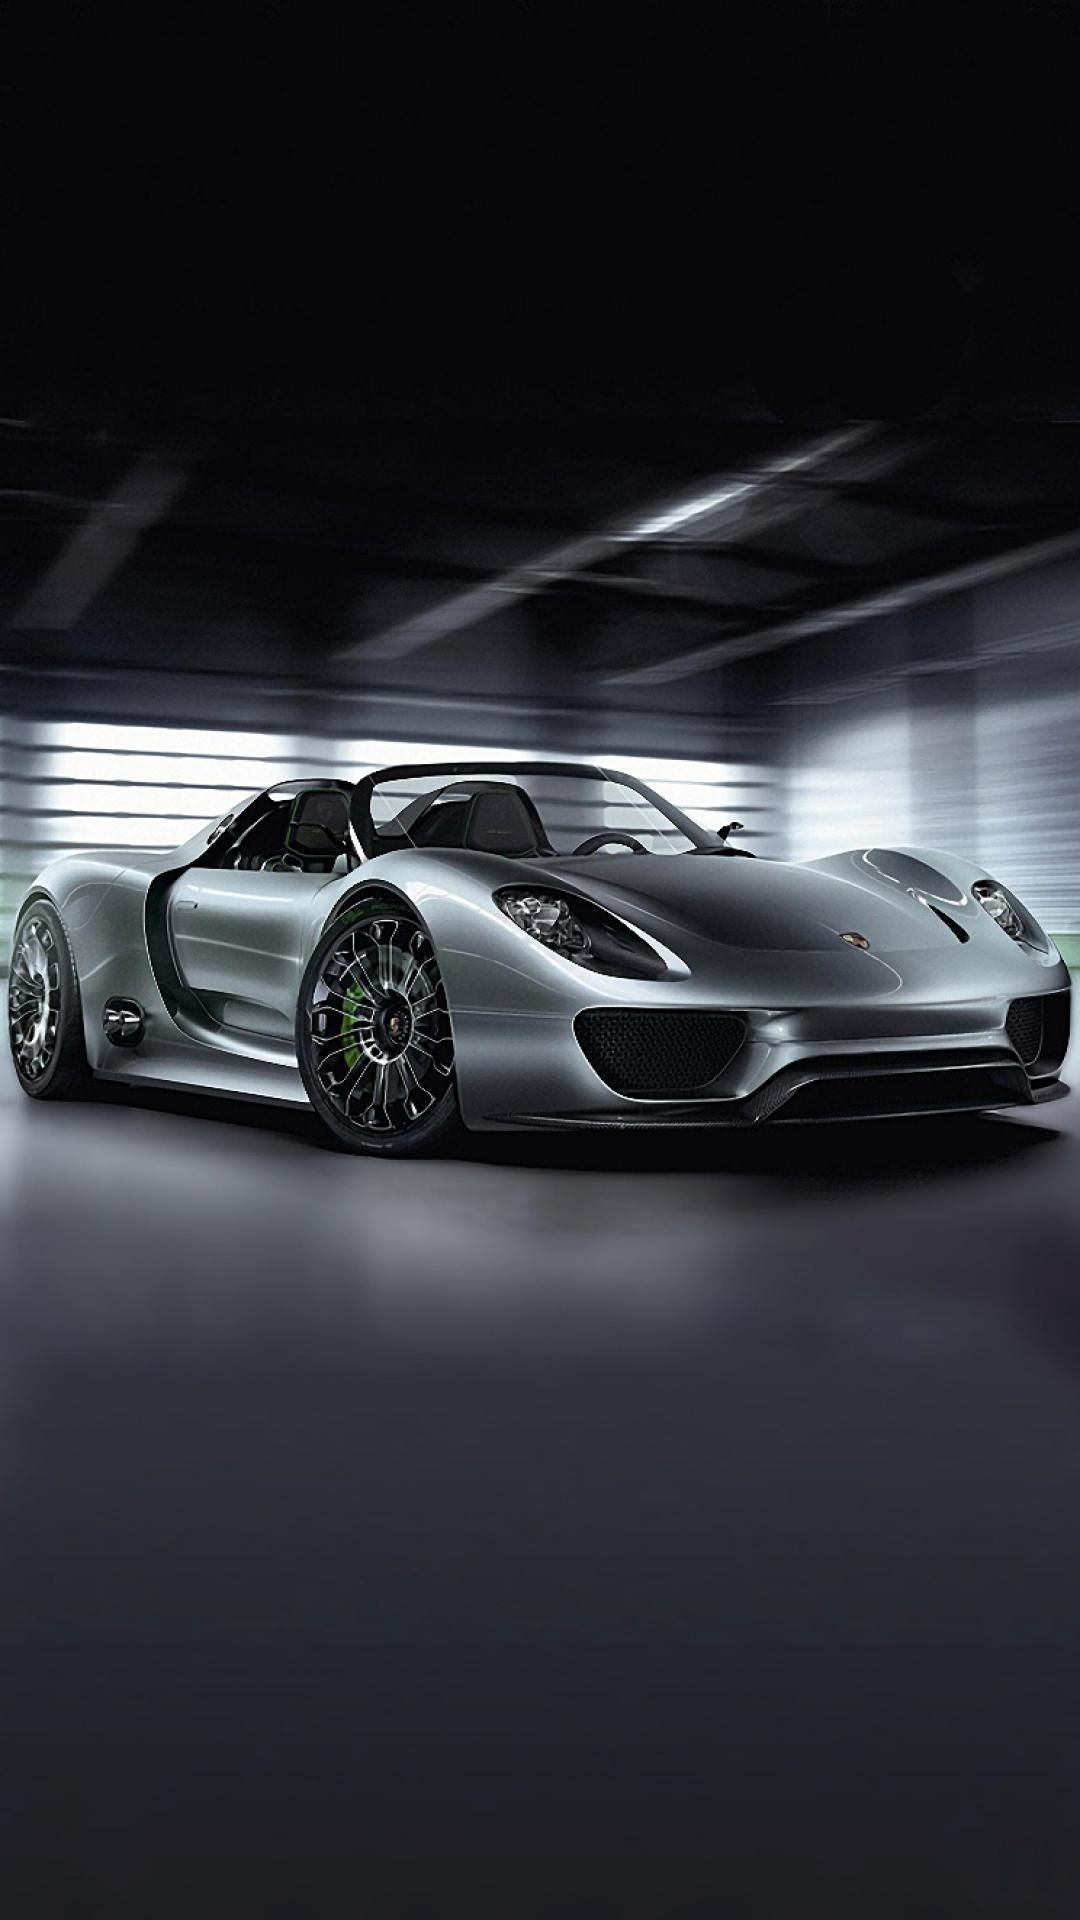 Silver Quenalbertini Iphone Wallpaper Iphone 6 Retina Wallpaper Electric Sports Car Porsche 918 Porsche Cars